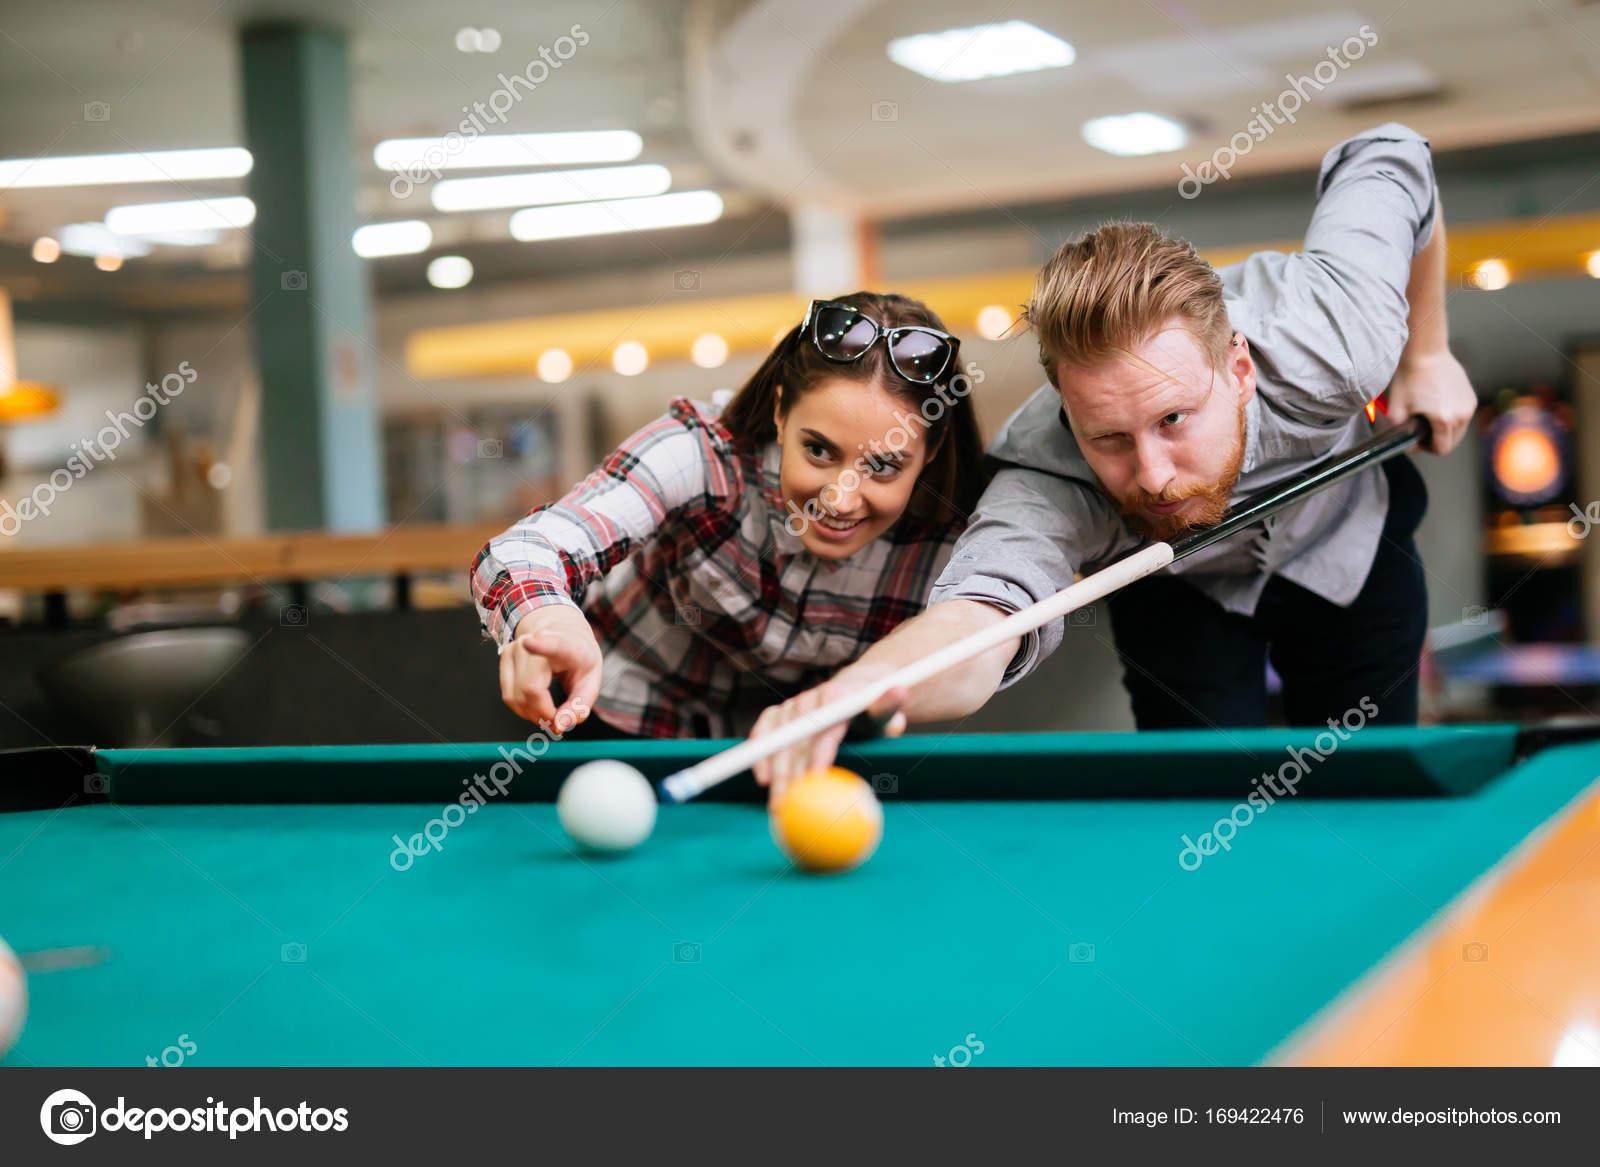 speed dating barcelona snooker